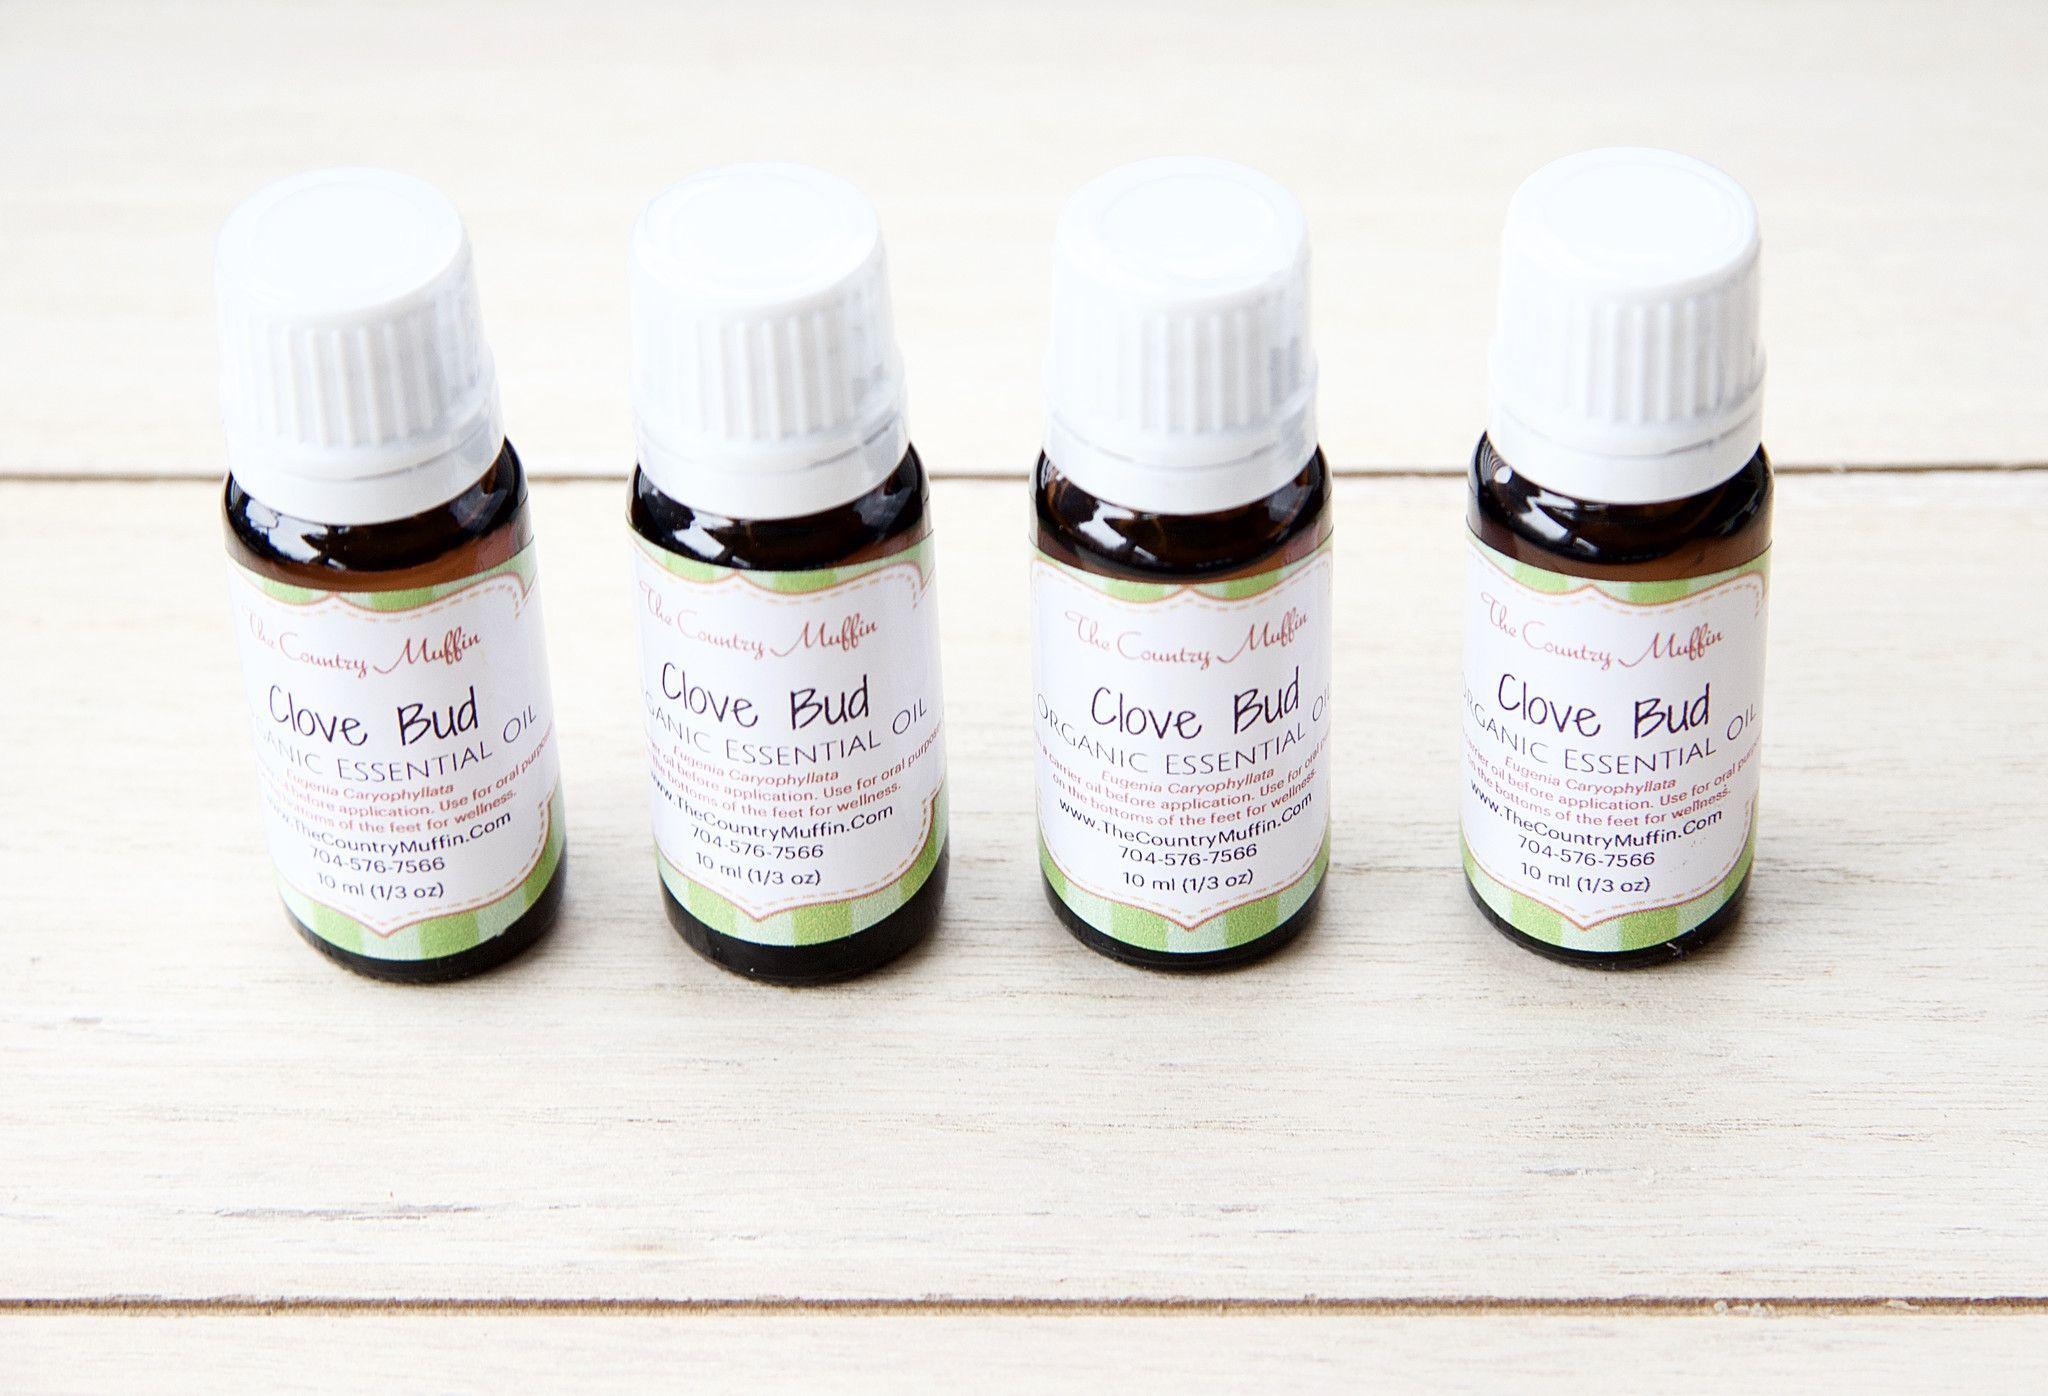 Clove Bud Essential Oil Organic  Products  Pinterest  Clove bud